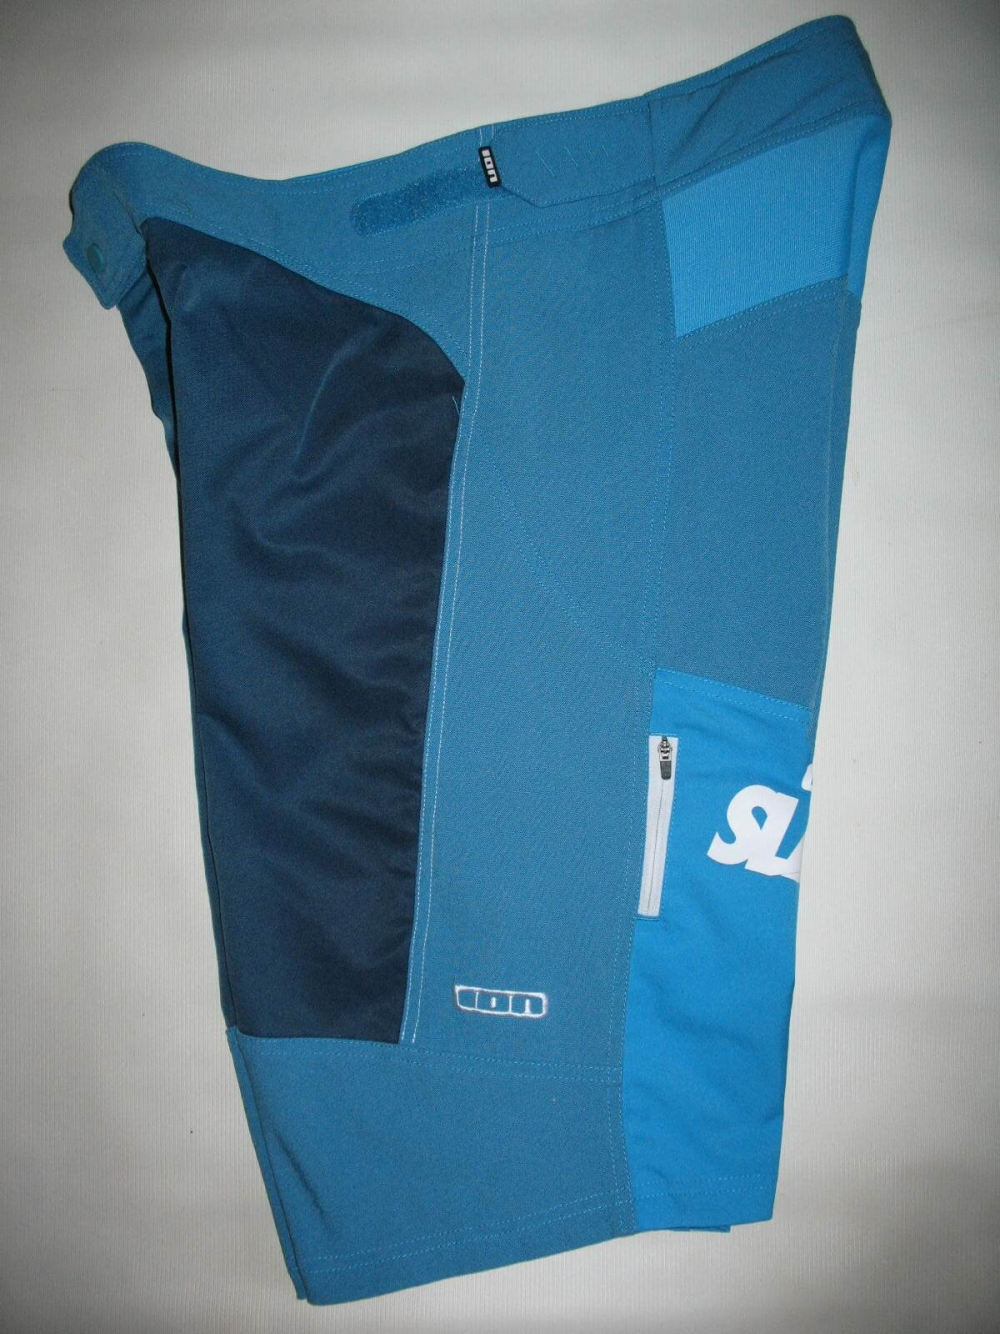 Шорты ION slash series DH shorts (размер 36/XL) - 3